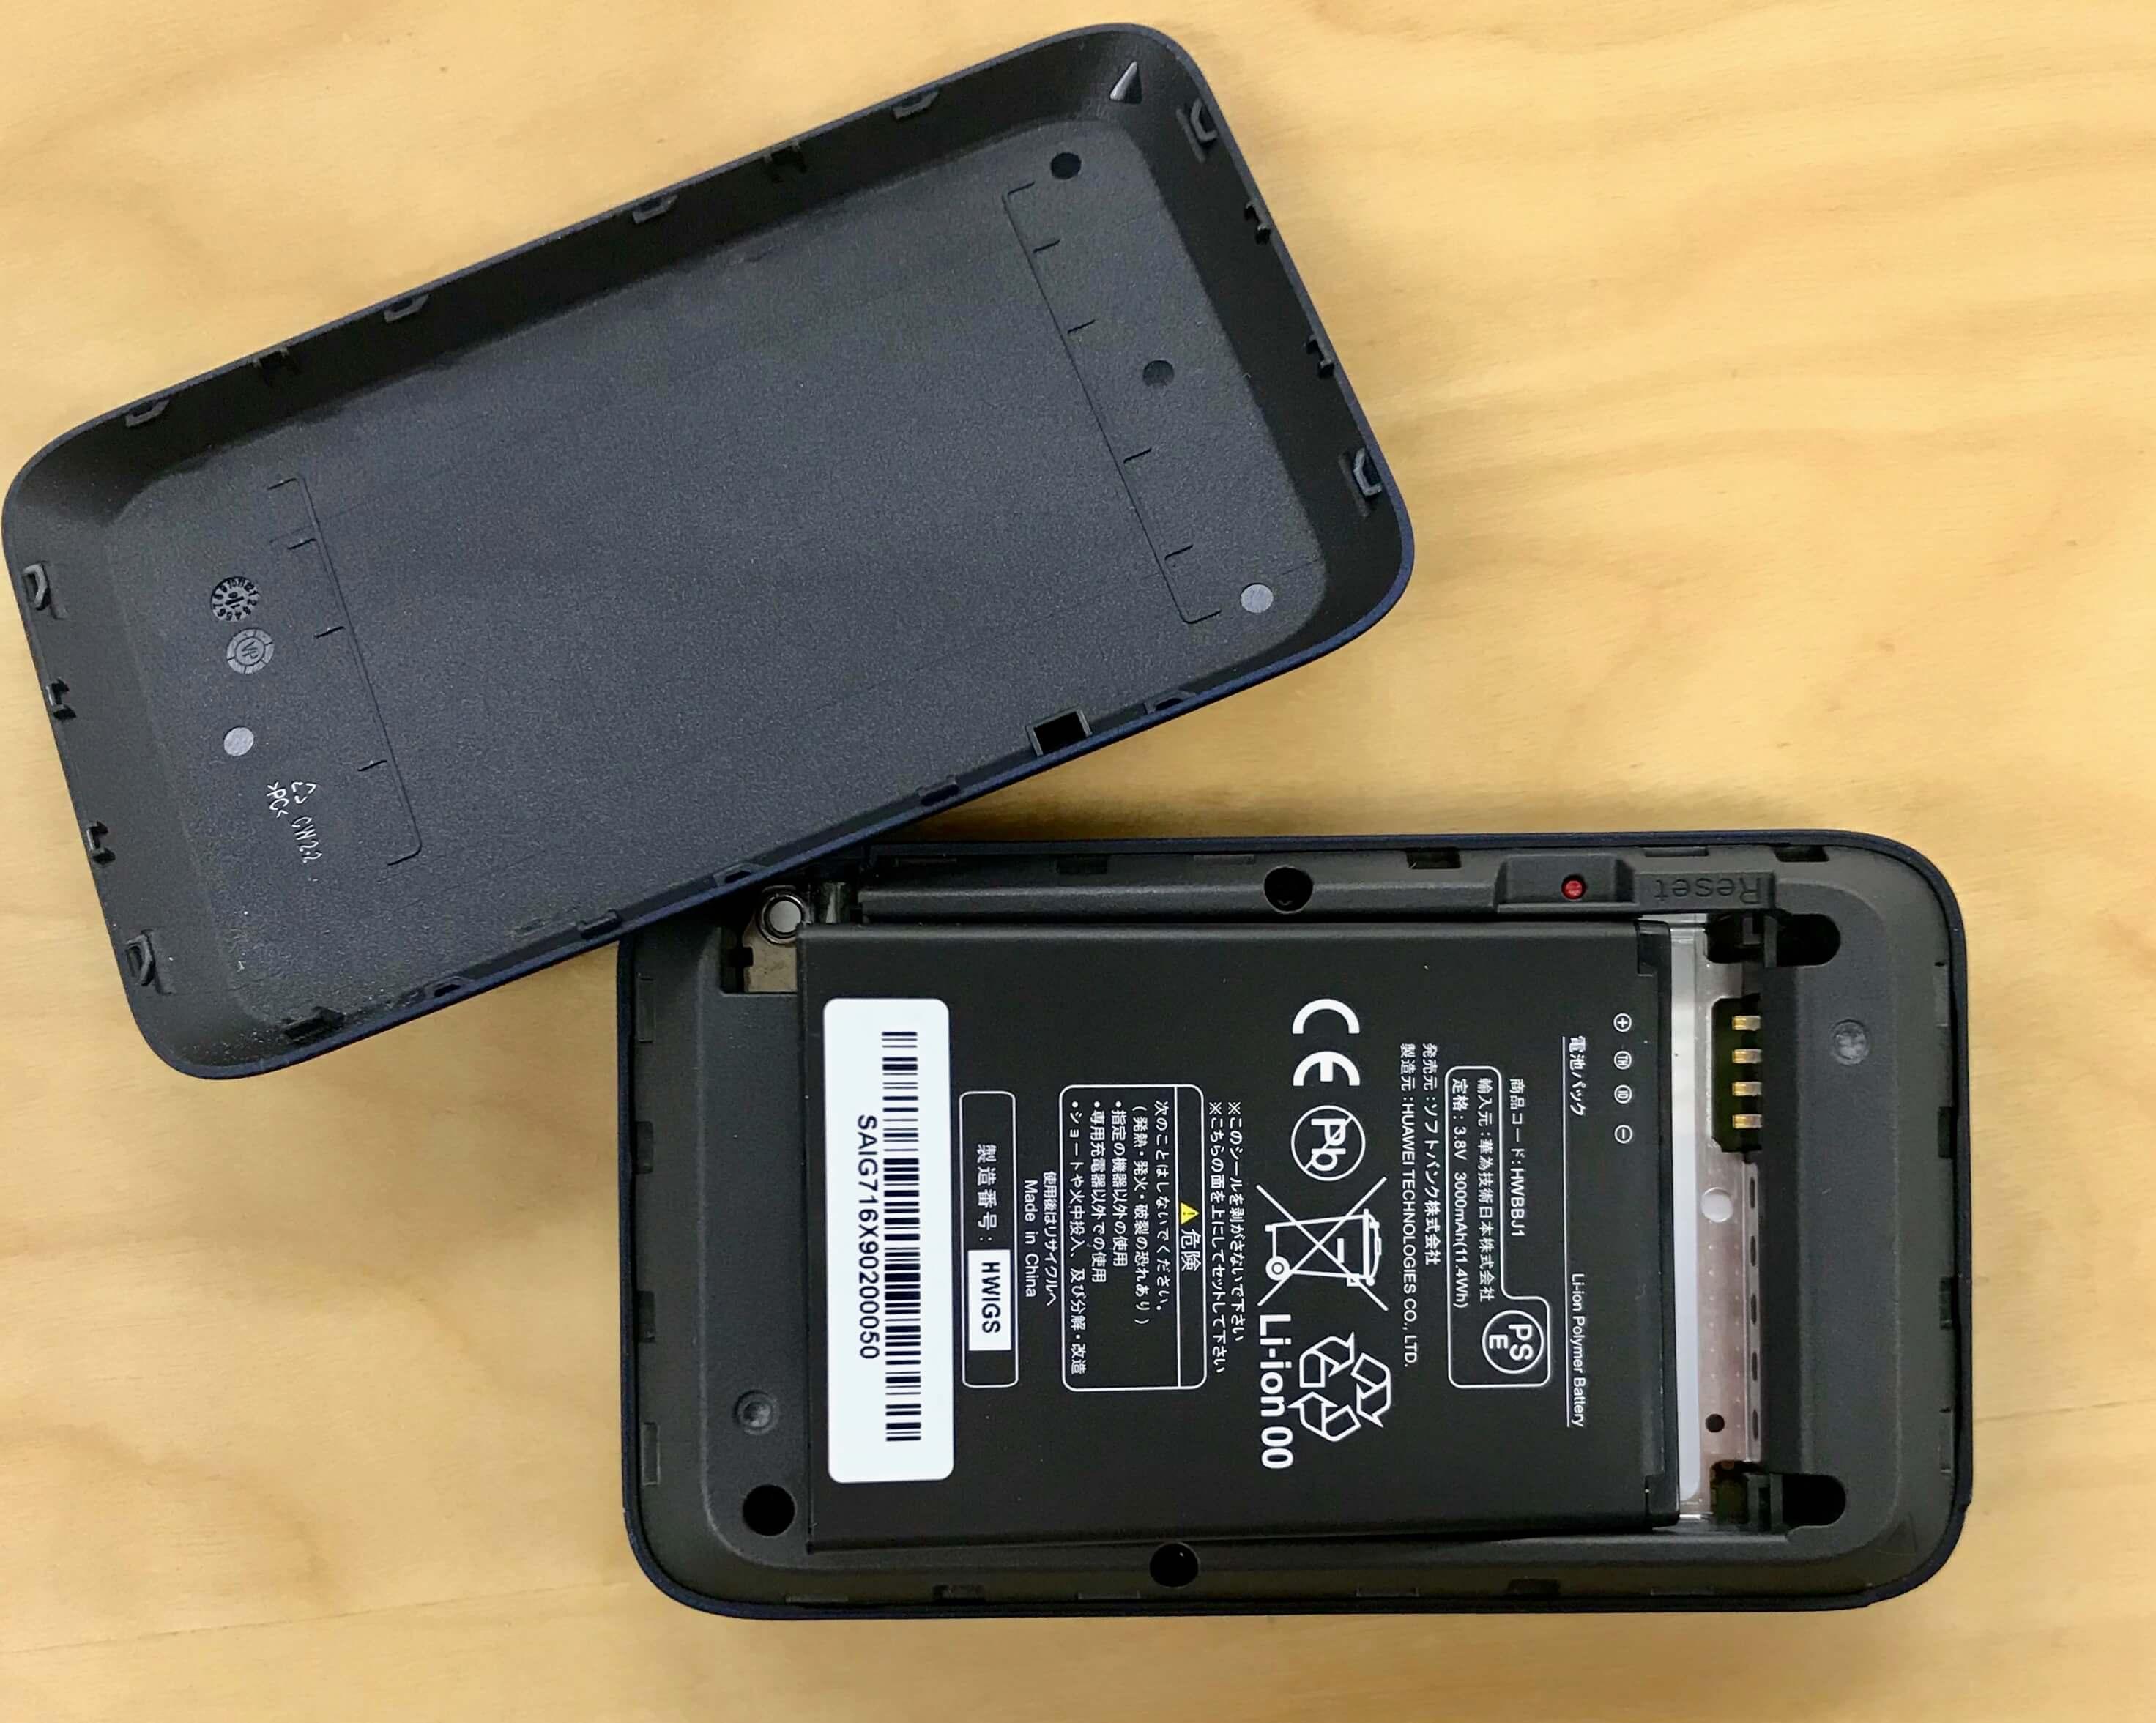 Set Up Pocket WiFi   Pocket WiFi and SIM provider - eConnect Japan